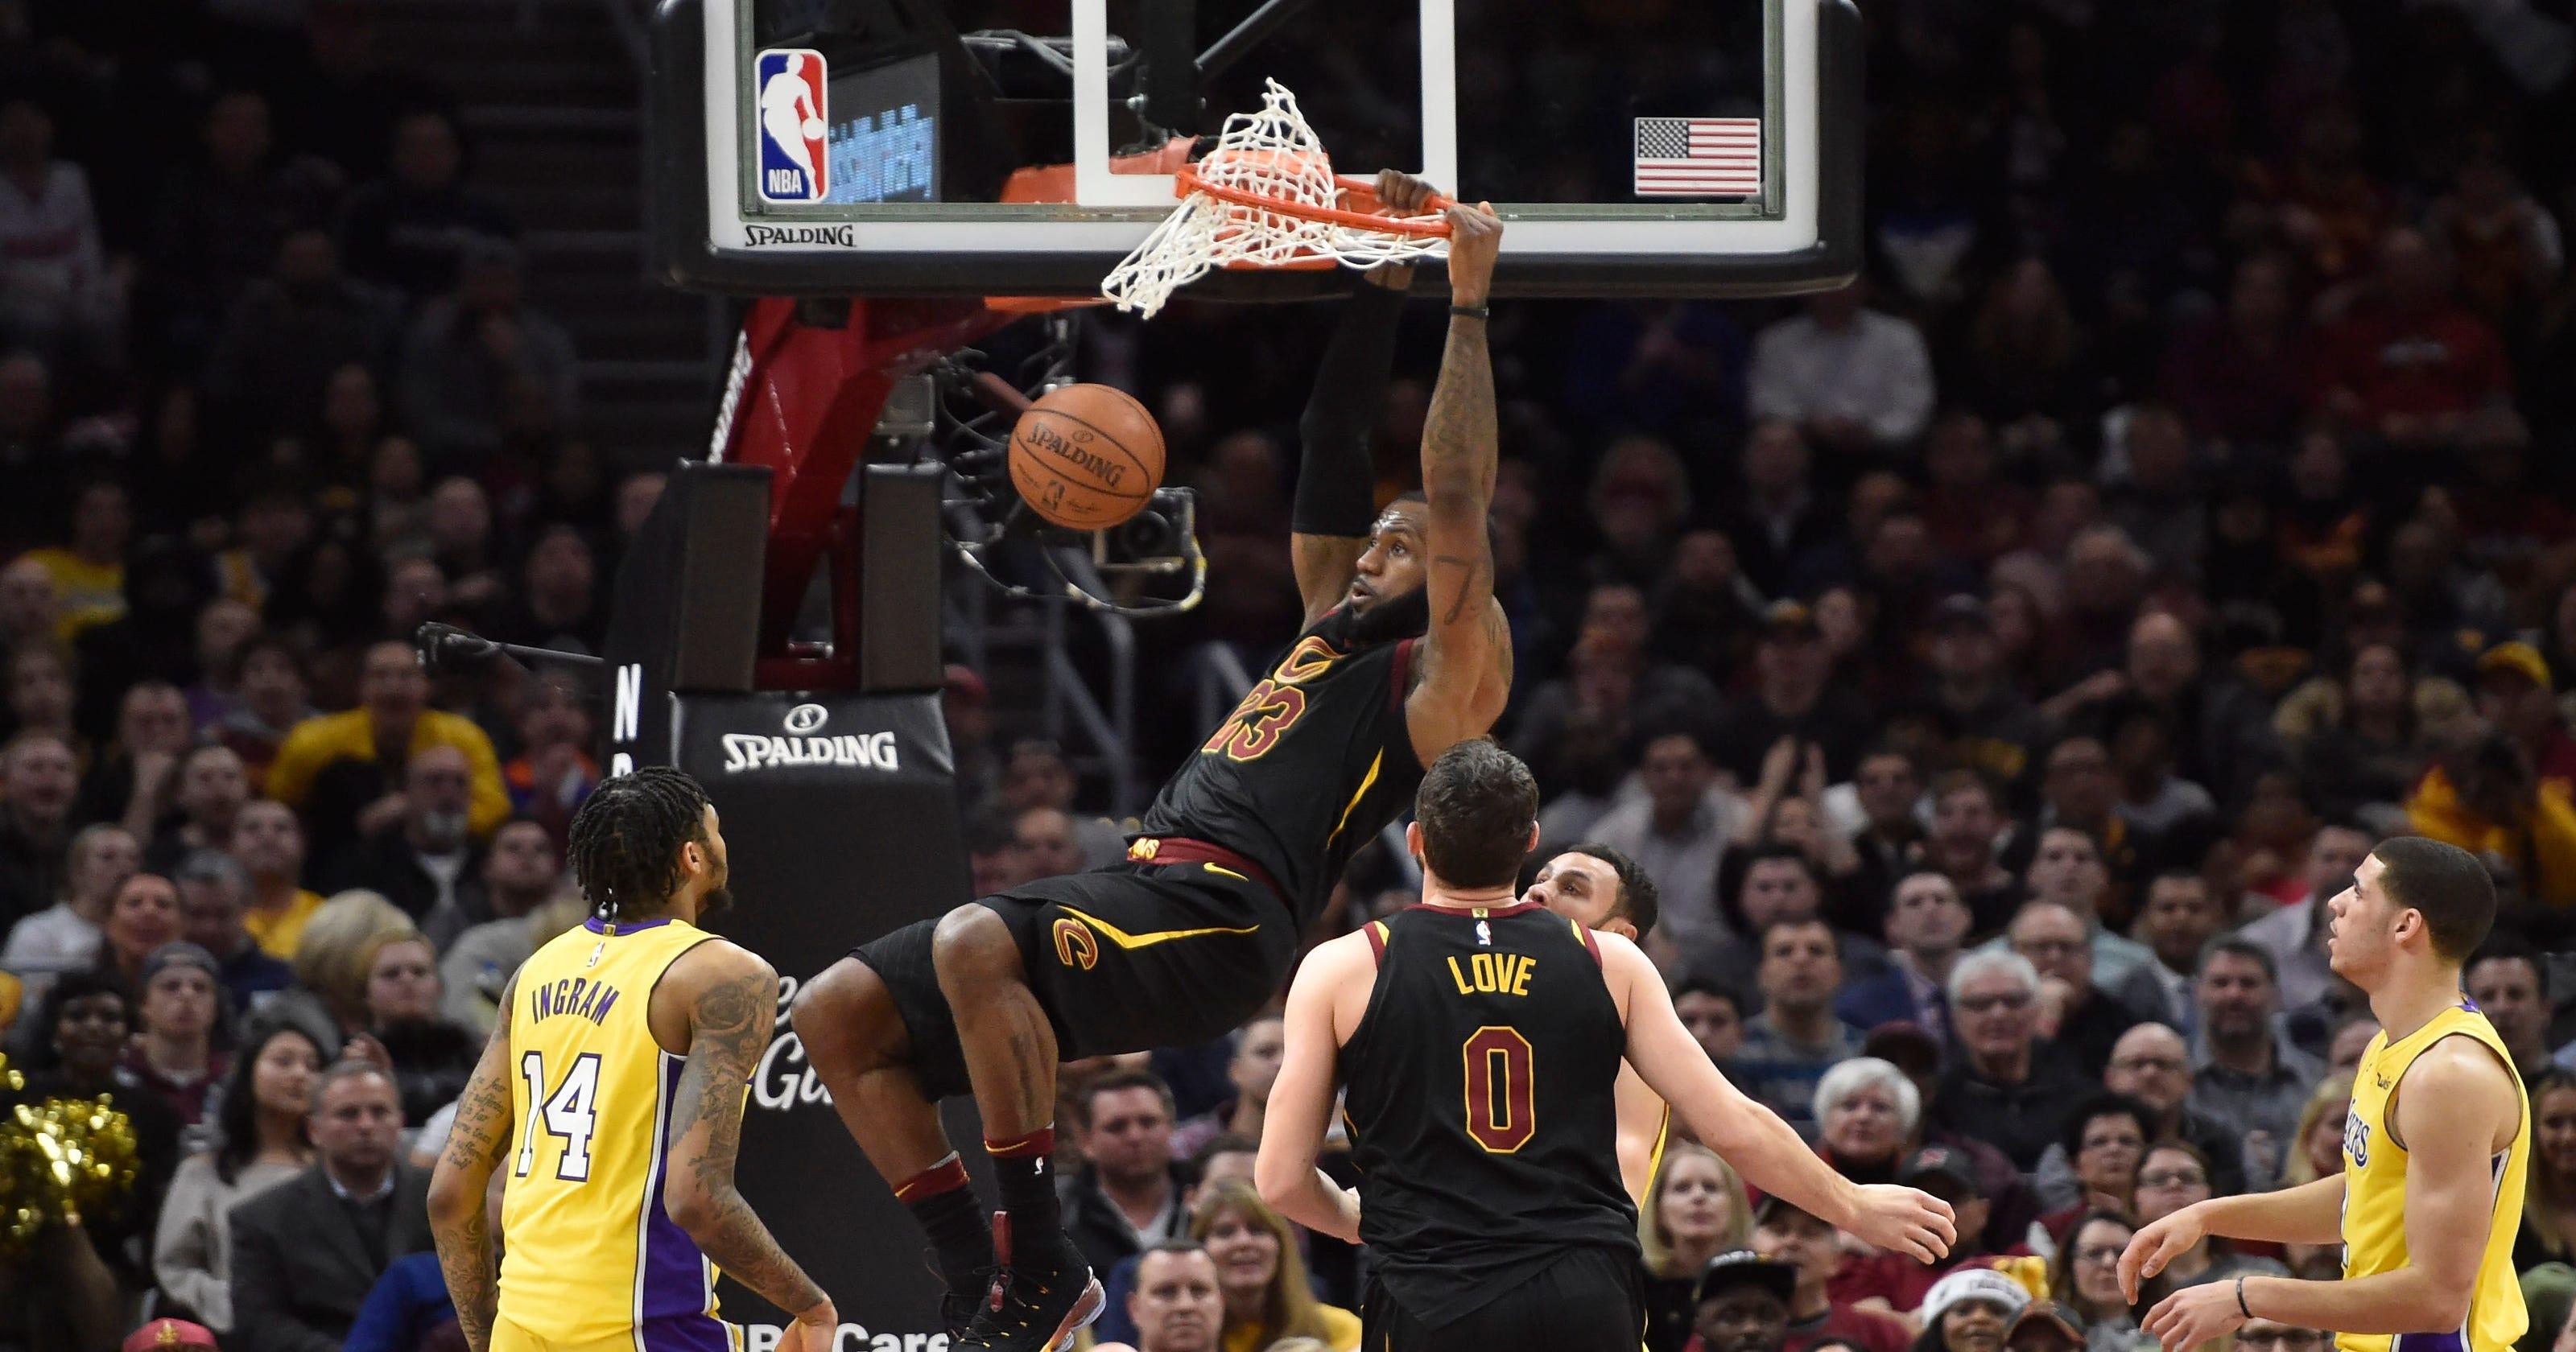 b6d6201bd48c LeBron James notches triple-double as Cavaliers top Lakers